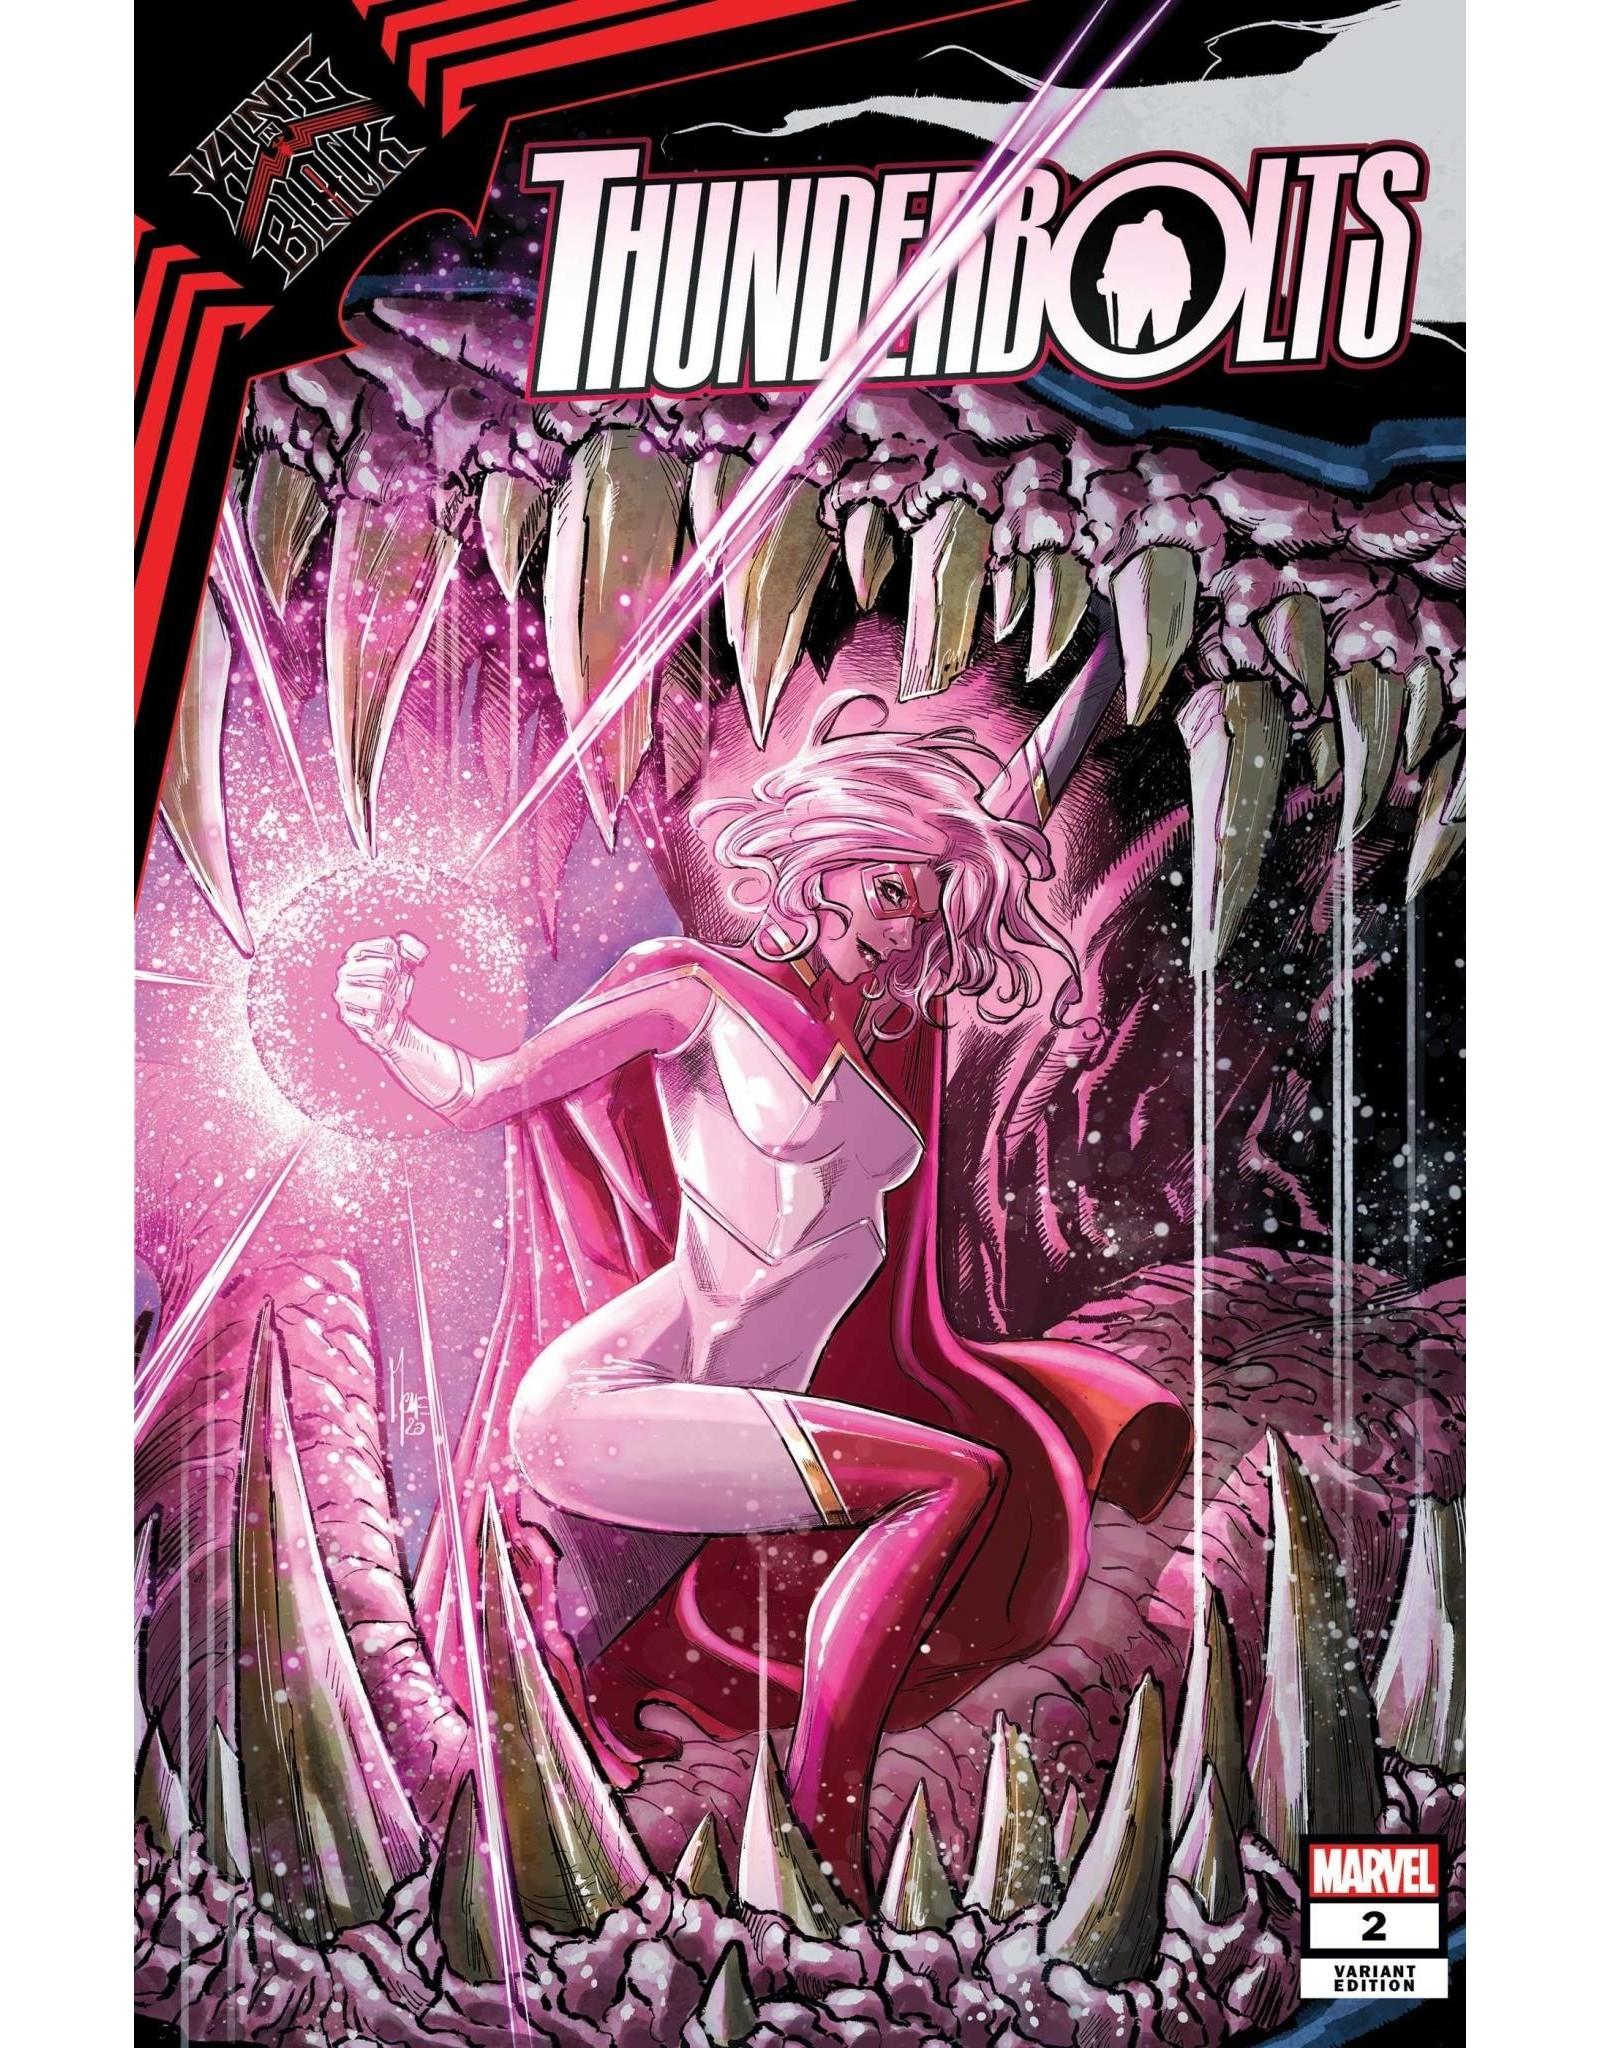 Marvel Comics KING IN BLACK THUNDERBOLTS #2 (OF 3) CHECCHETTO VAR